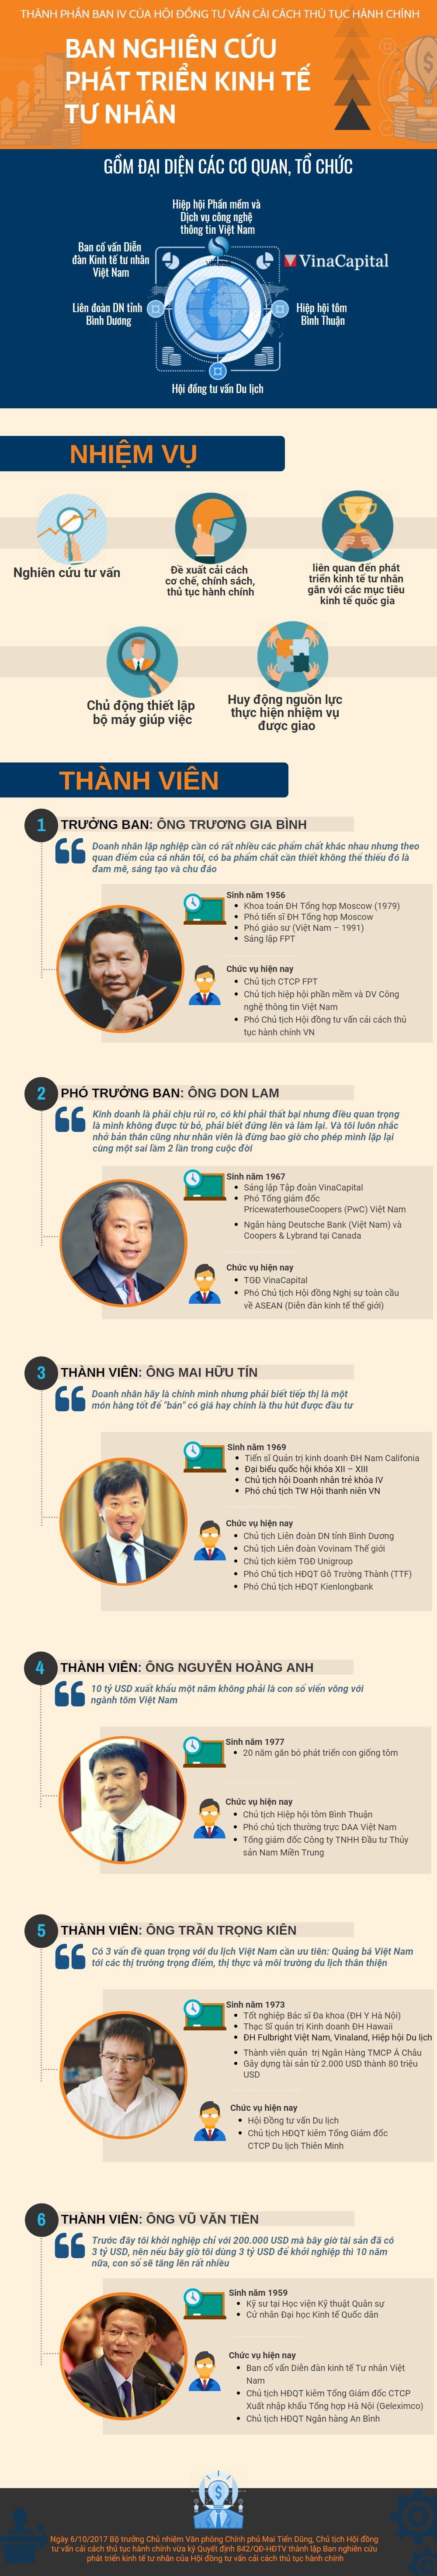 infographic chan dung 6 thanh vien ban nghien cuu phat trien kinh te tu nhan cua chinh phu